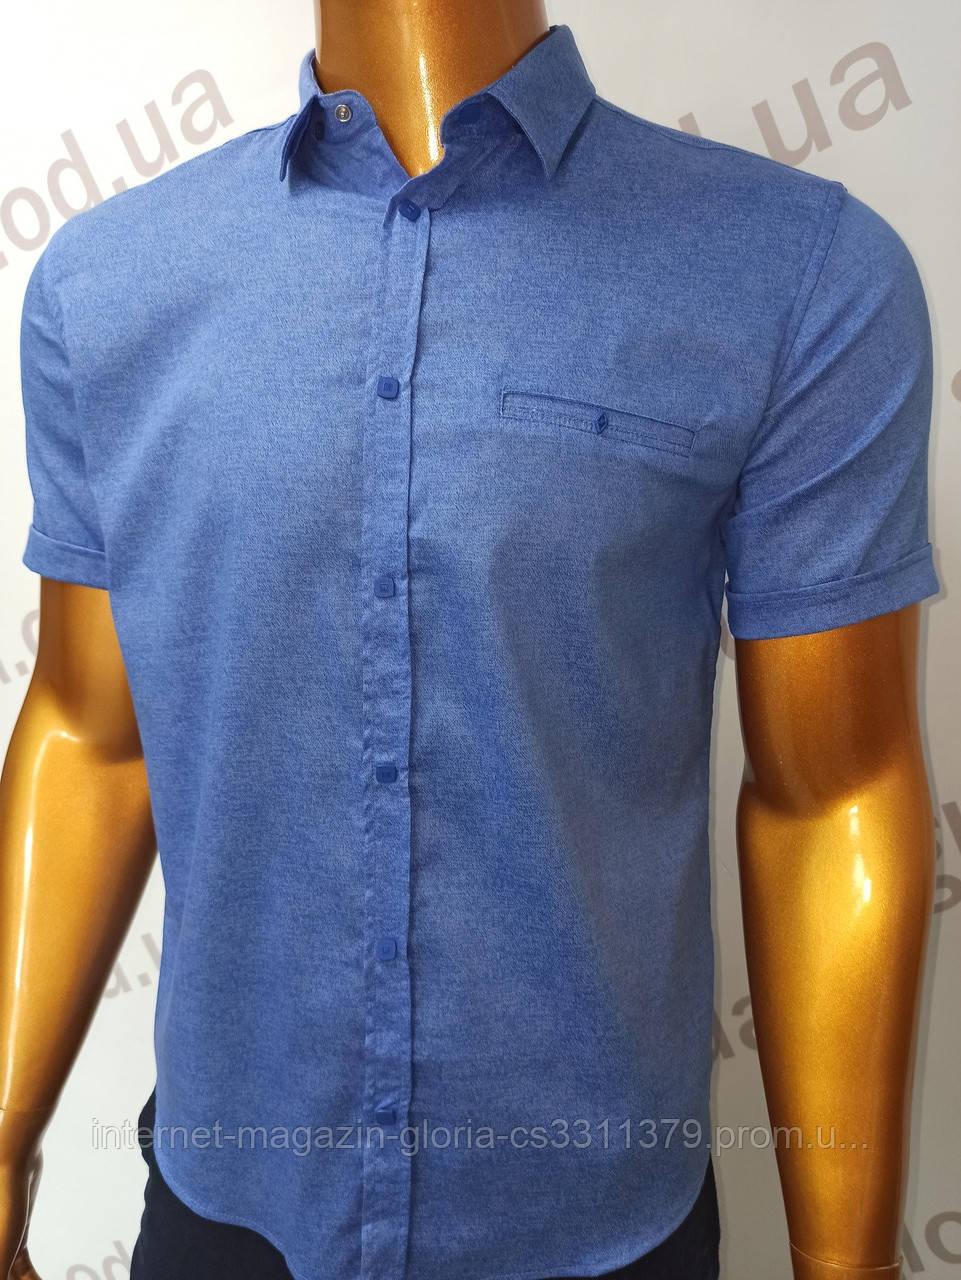 Мужская рубашка Amato. AG.19397-2(f). Размеры:M,L,XL(2), 2XL.